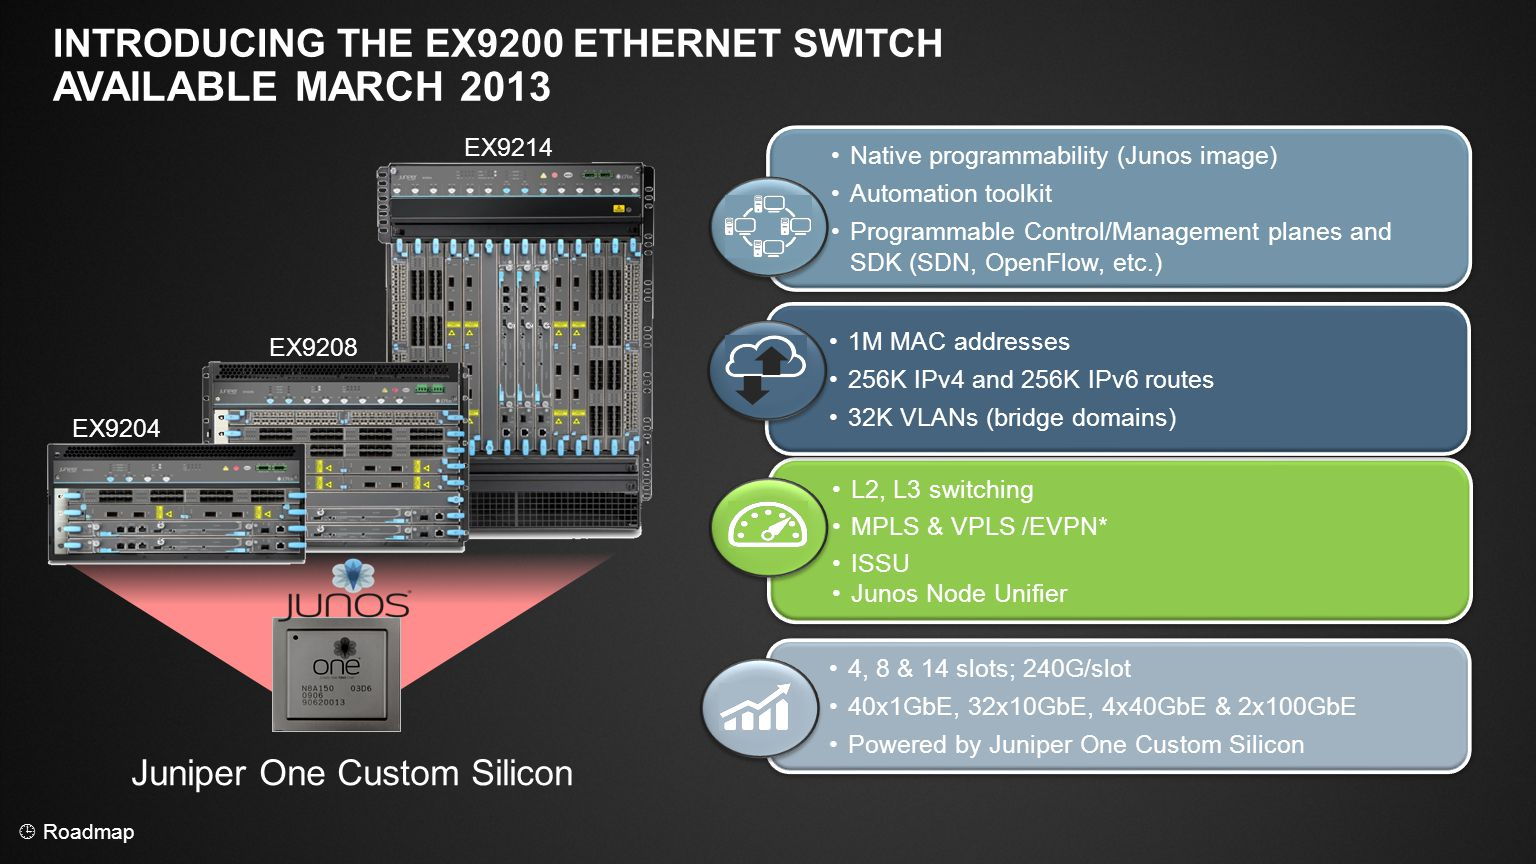 Slide Type Juniper Networks Large Venue Template / 16x9 / V6 EX9200 LINE CARDS  40 x 10/100/1000BASE-T  40 x 100FX/1000BASE-X SFP 1GbE Line Cards 10GbE Line Card 40GbE Line Card 100GbE Line Card  32 x 10GbE SFP+  Up to 240G throughput  4 x 40GE QSFP+  Up to 120G throughput  2 x 100G CFP + 8 x 10GbE SFP+  Up to 240G throughput EX9200-4QS EX9200-2C-8XS EX9200-32XS EX9200-40F/40T